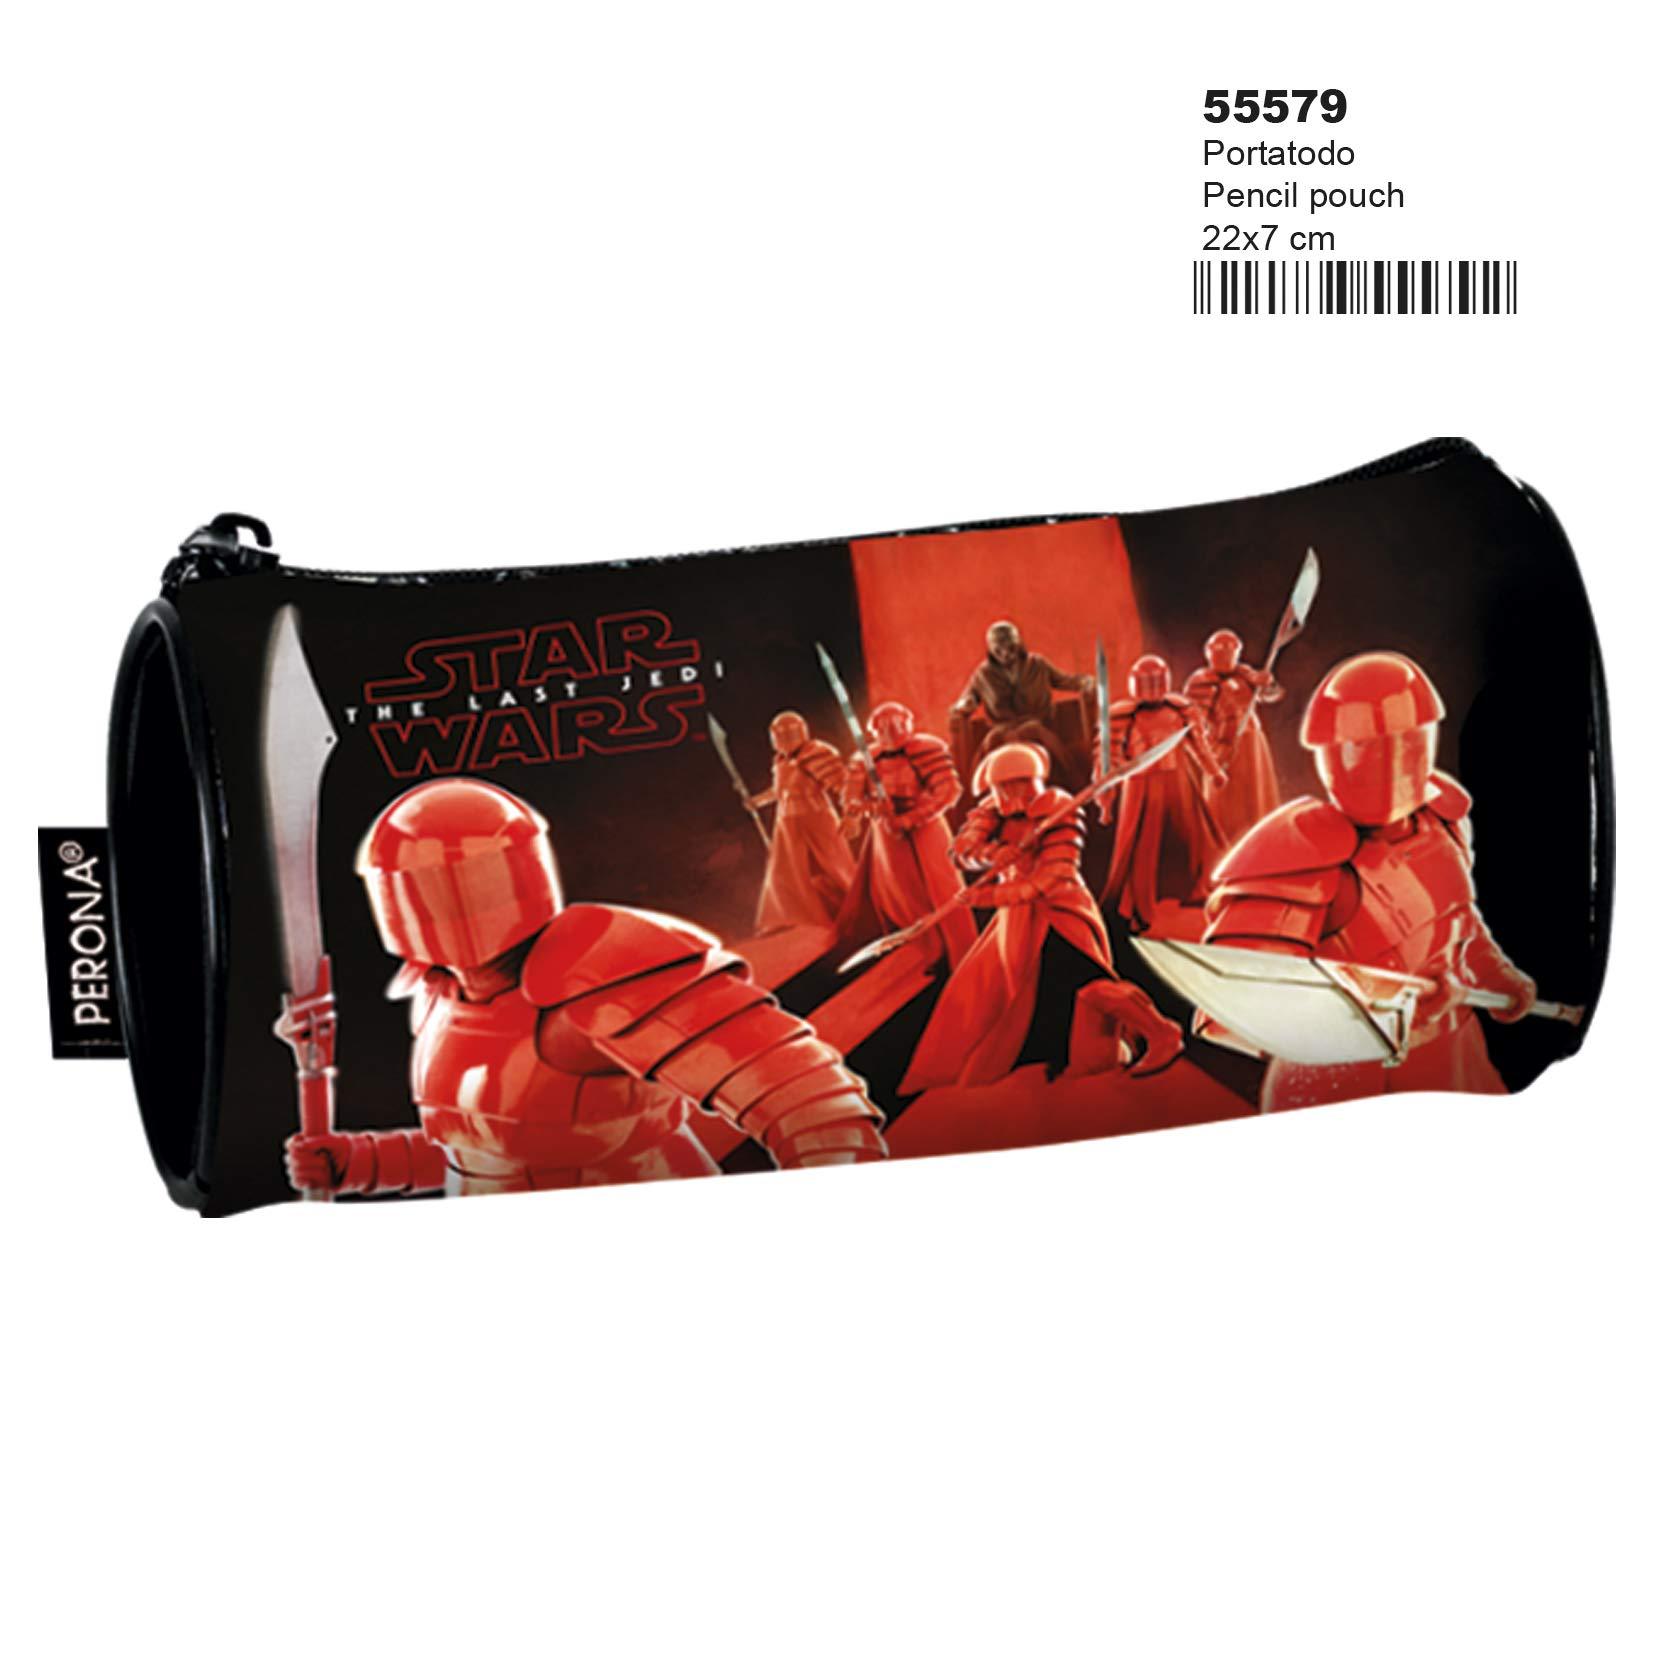 Star Wars Vicious – Estuche portatodo redondo